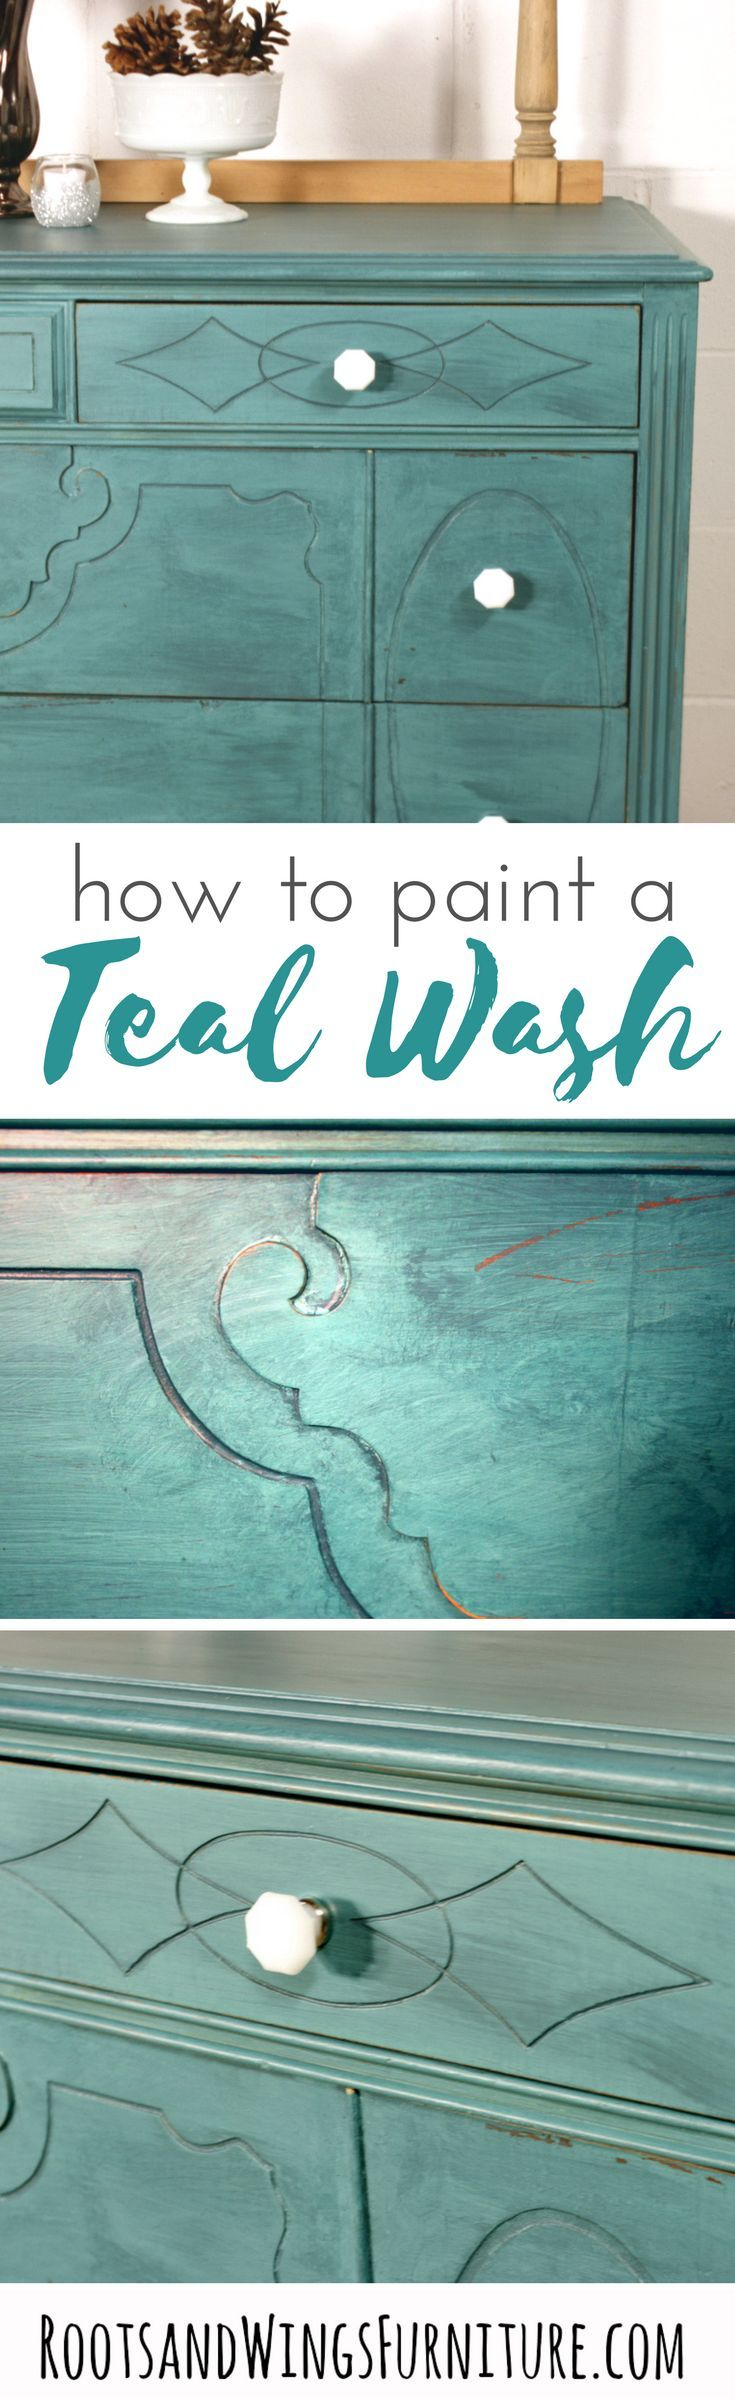 Furniture painting ideas techniques - Color Washed Teal Dresser Paint Furniturefurniture Refinishingfurniture Makeoverfurniture Ideaspaint Techniques